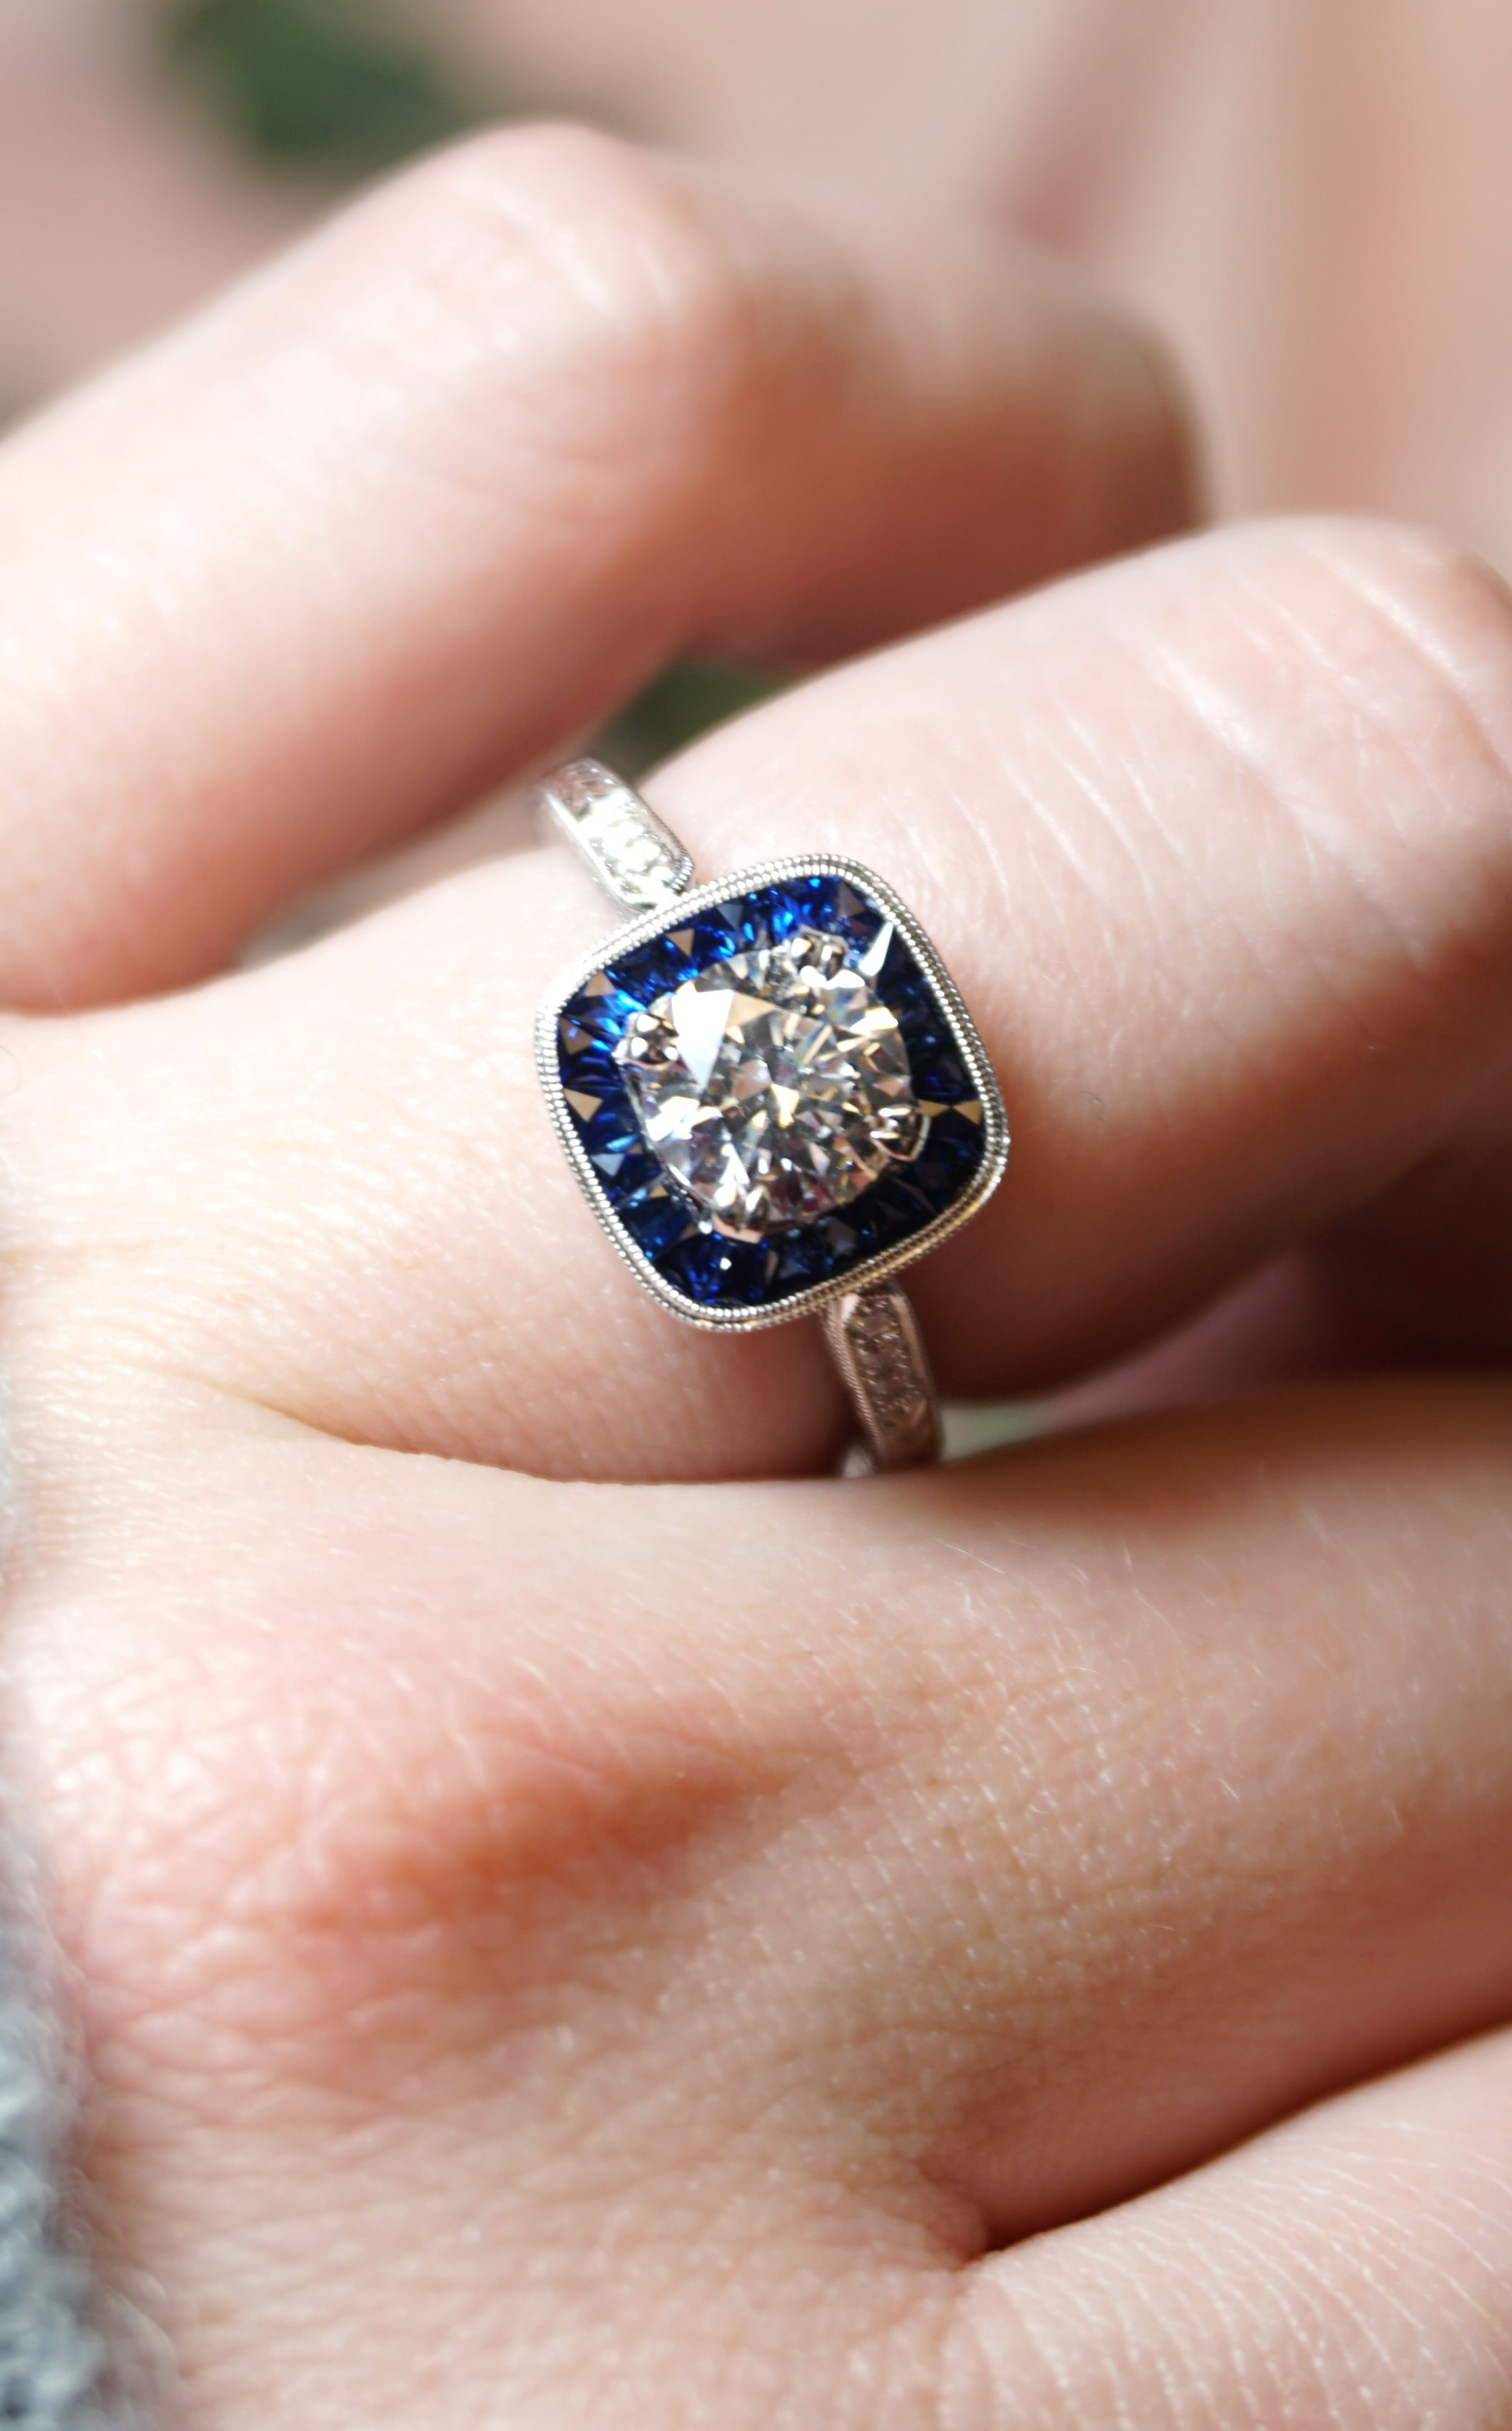 Art Deco Style Blue Sapphire Halo And Diamond Engagement Ring #100384 - Seattle Bellevue   Joseph Jewelry -  Blue Sapphire Vintage-Inspired Art Deco Halo Diamond Engagement Ring   Joseph Jewelry   Bellevue    - #Art #Artdecoengagementring #Beachglassjewelry #Bellevue #Blue #Deco #Diamond #Engagement #Halo #ideasdiyjewelry #Jewelry #Joseph #noisepiercing #Ring #Sapphire #Seattle #Style